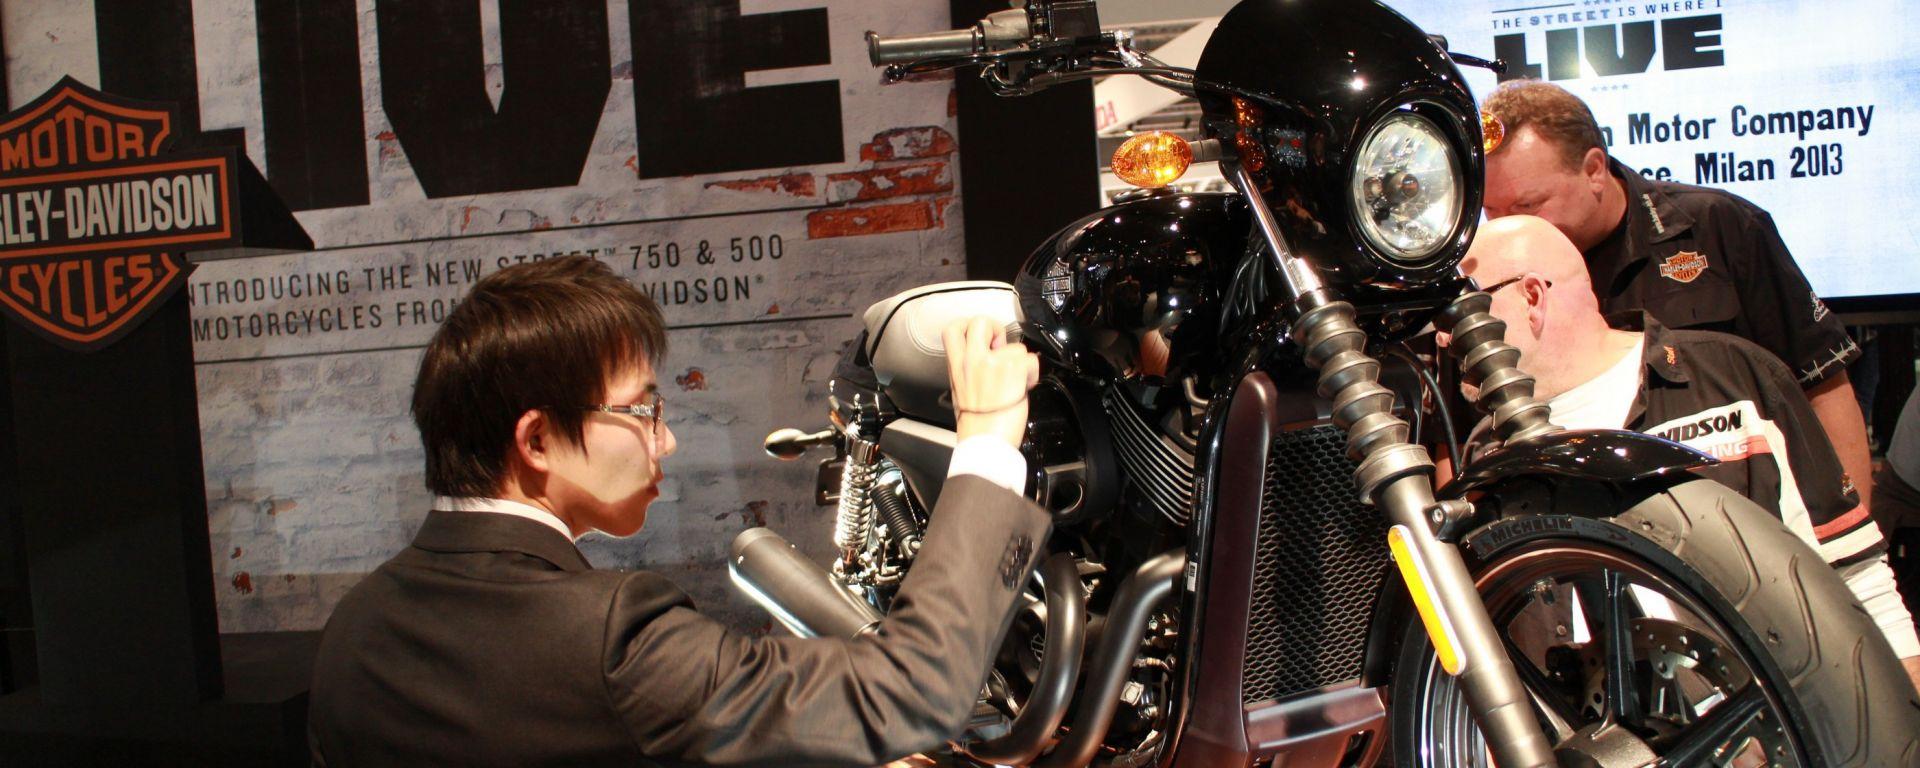 Eicma 2013, lo stand Harley-Davidson